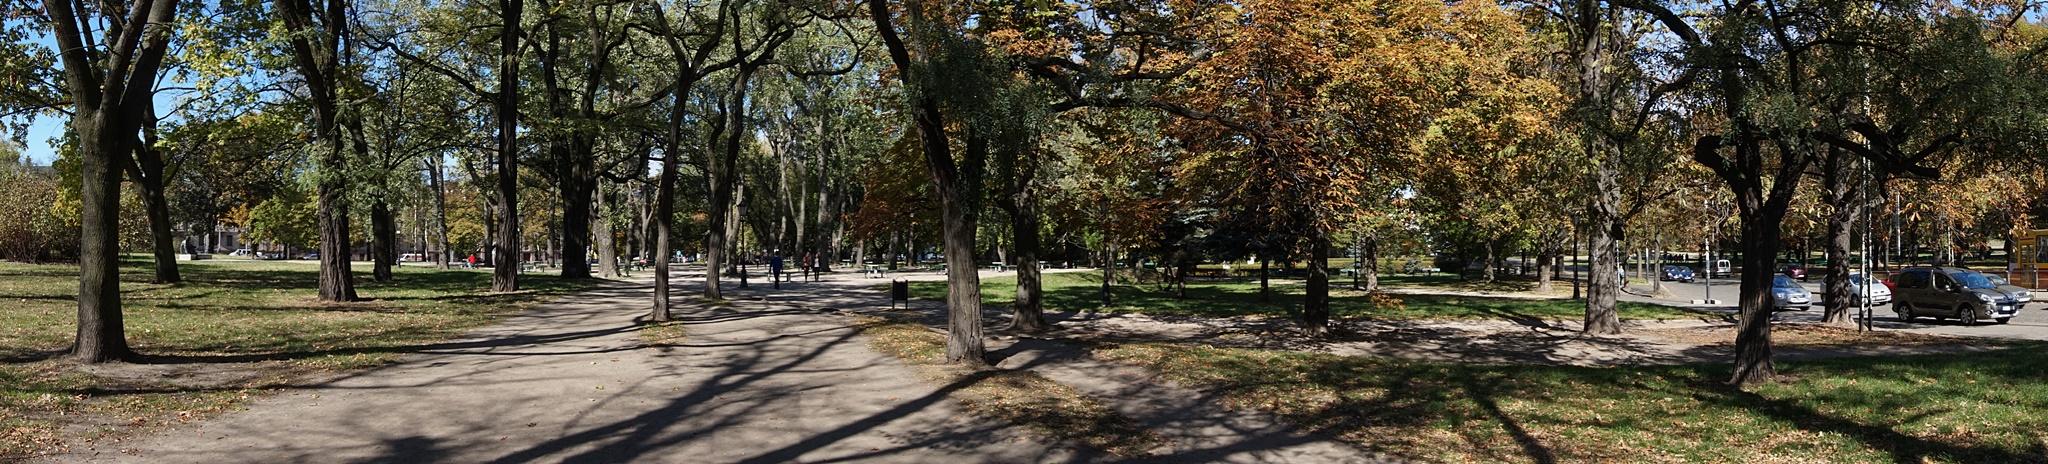 Park Staromiejski 1